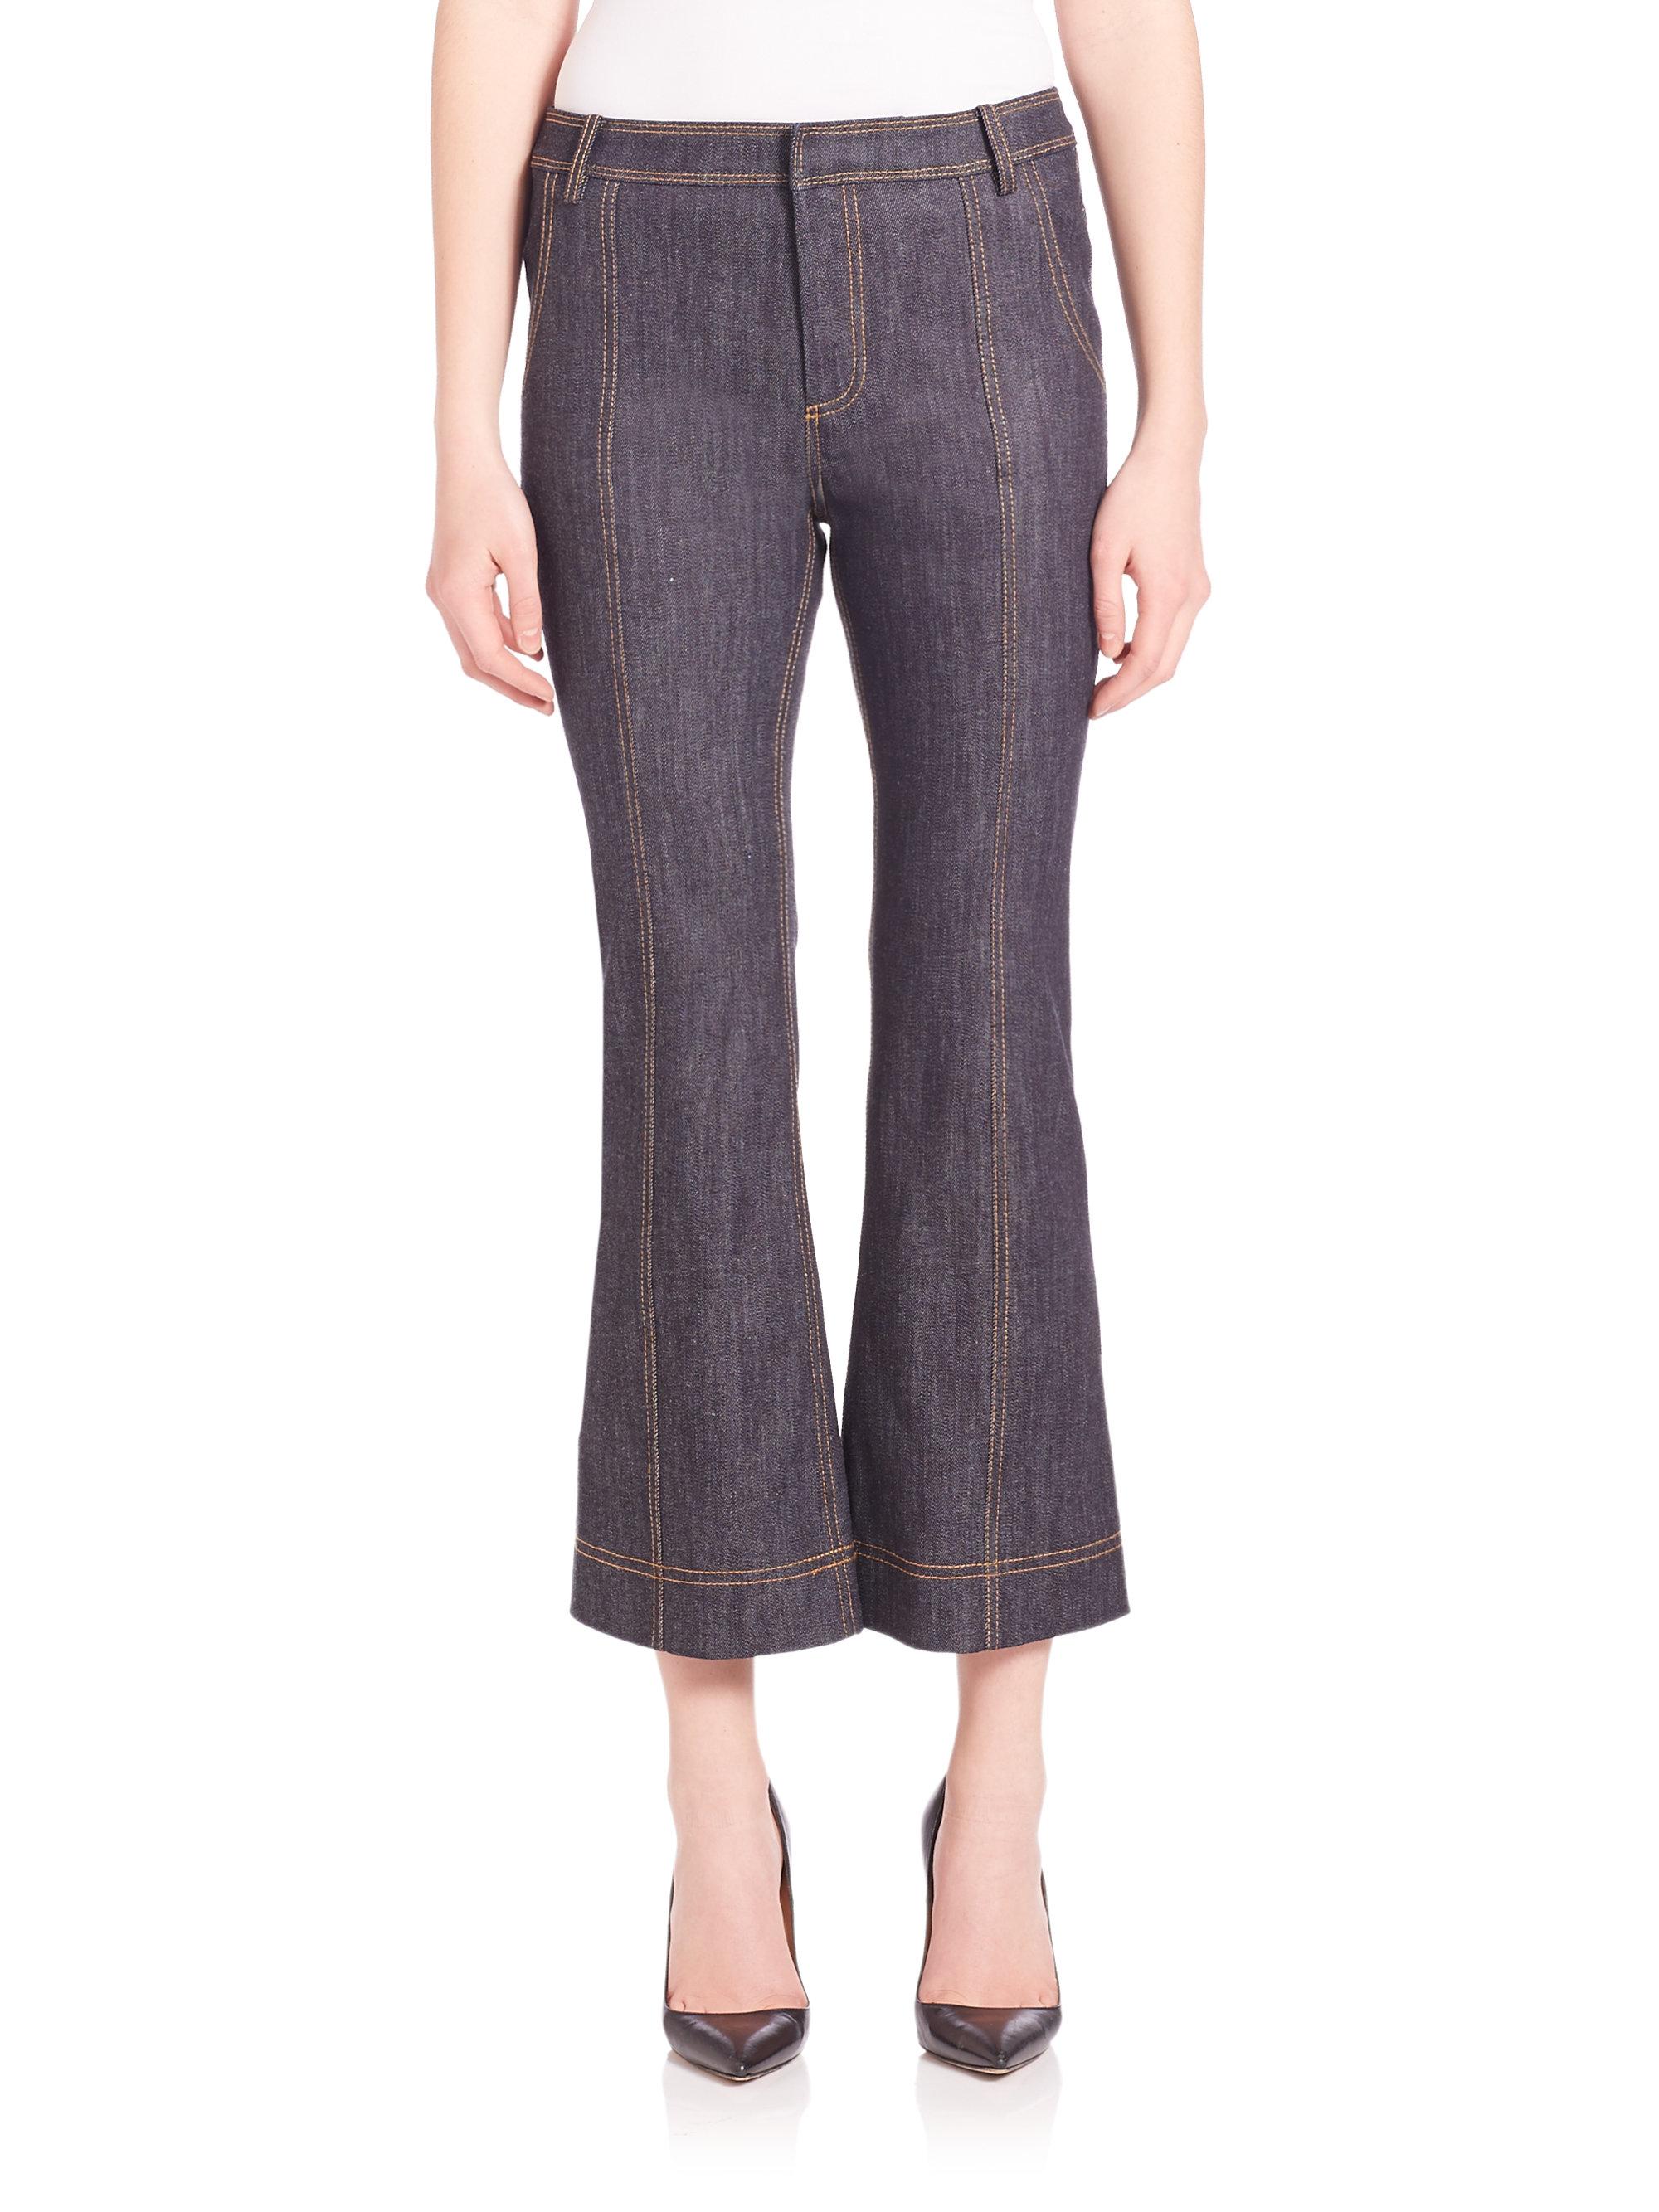 10 crosby derek lam cropped flare jeans in blue denim lyst. Black Bedroom Furniture Sets. Home Design Ideas